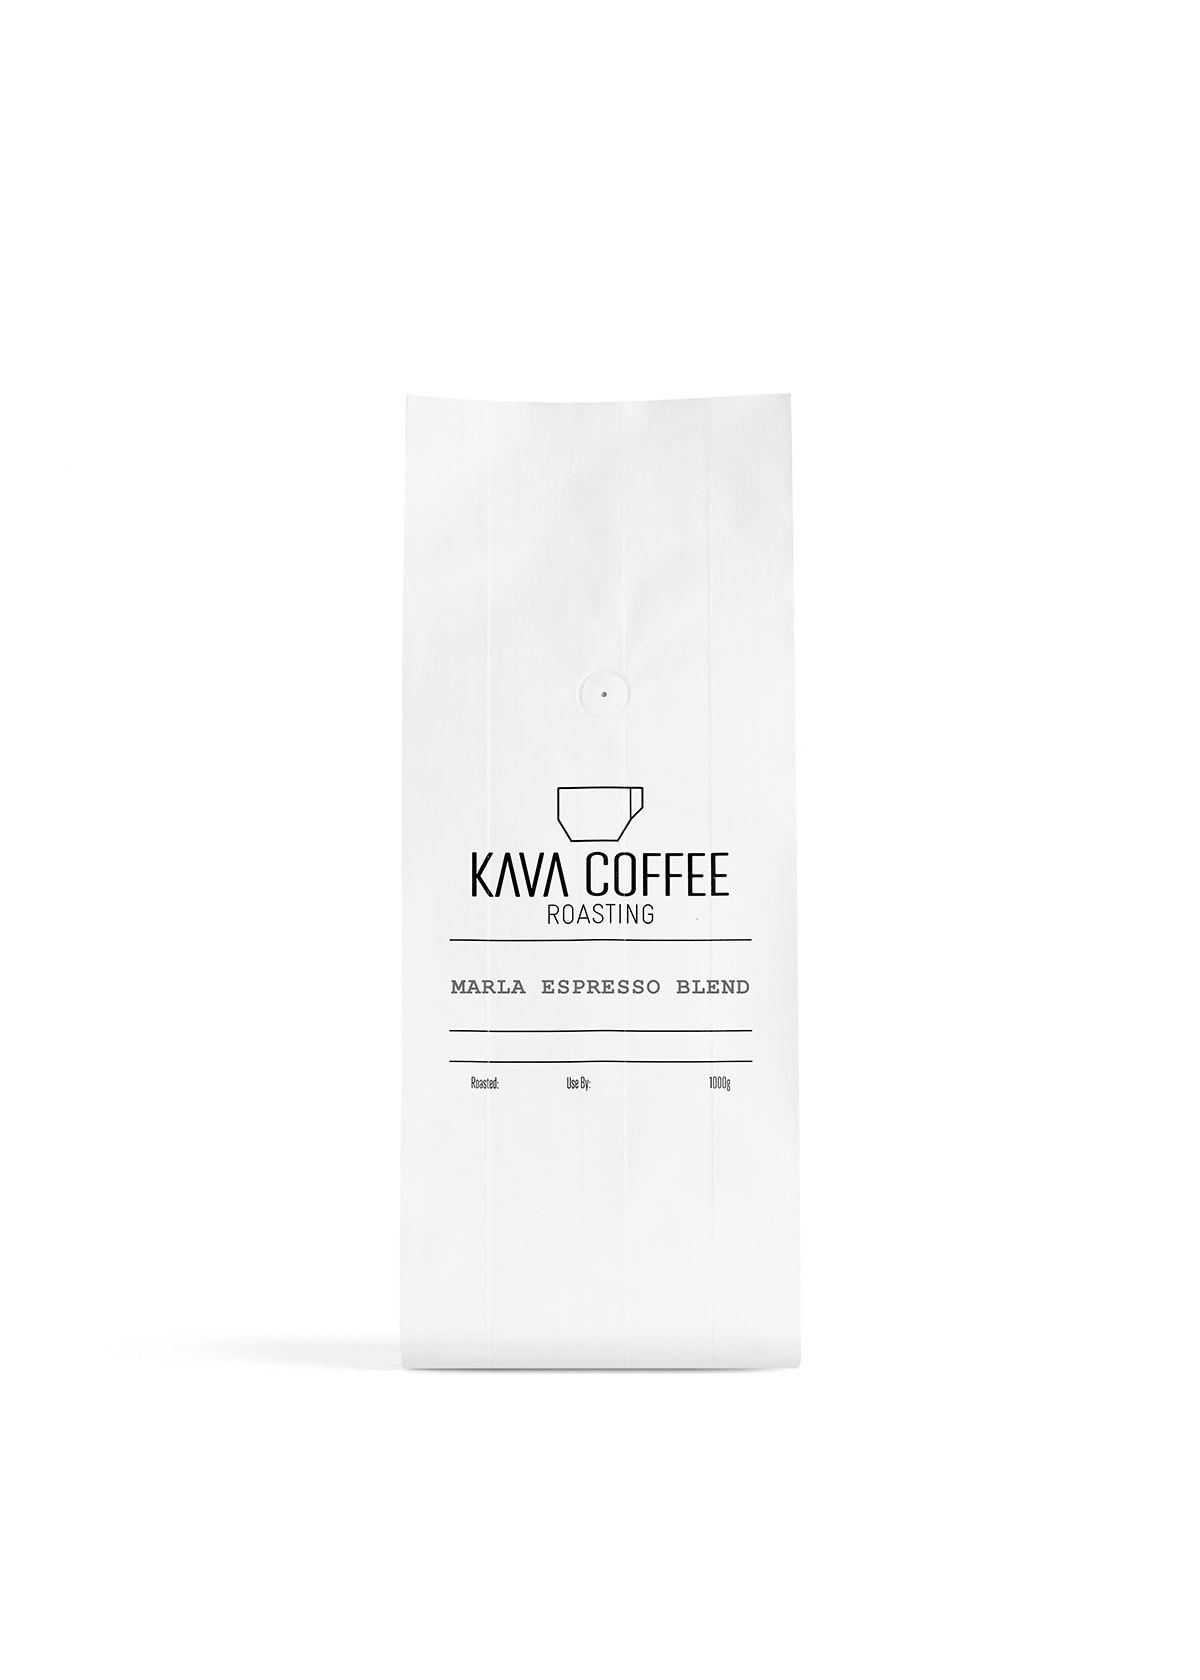 Marla Harman Espresso 1 kg